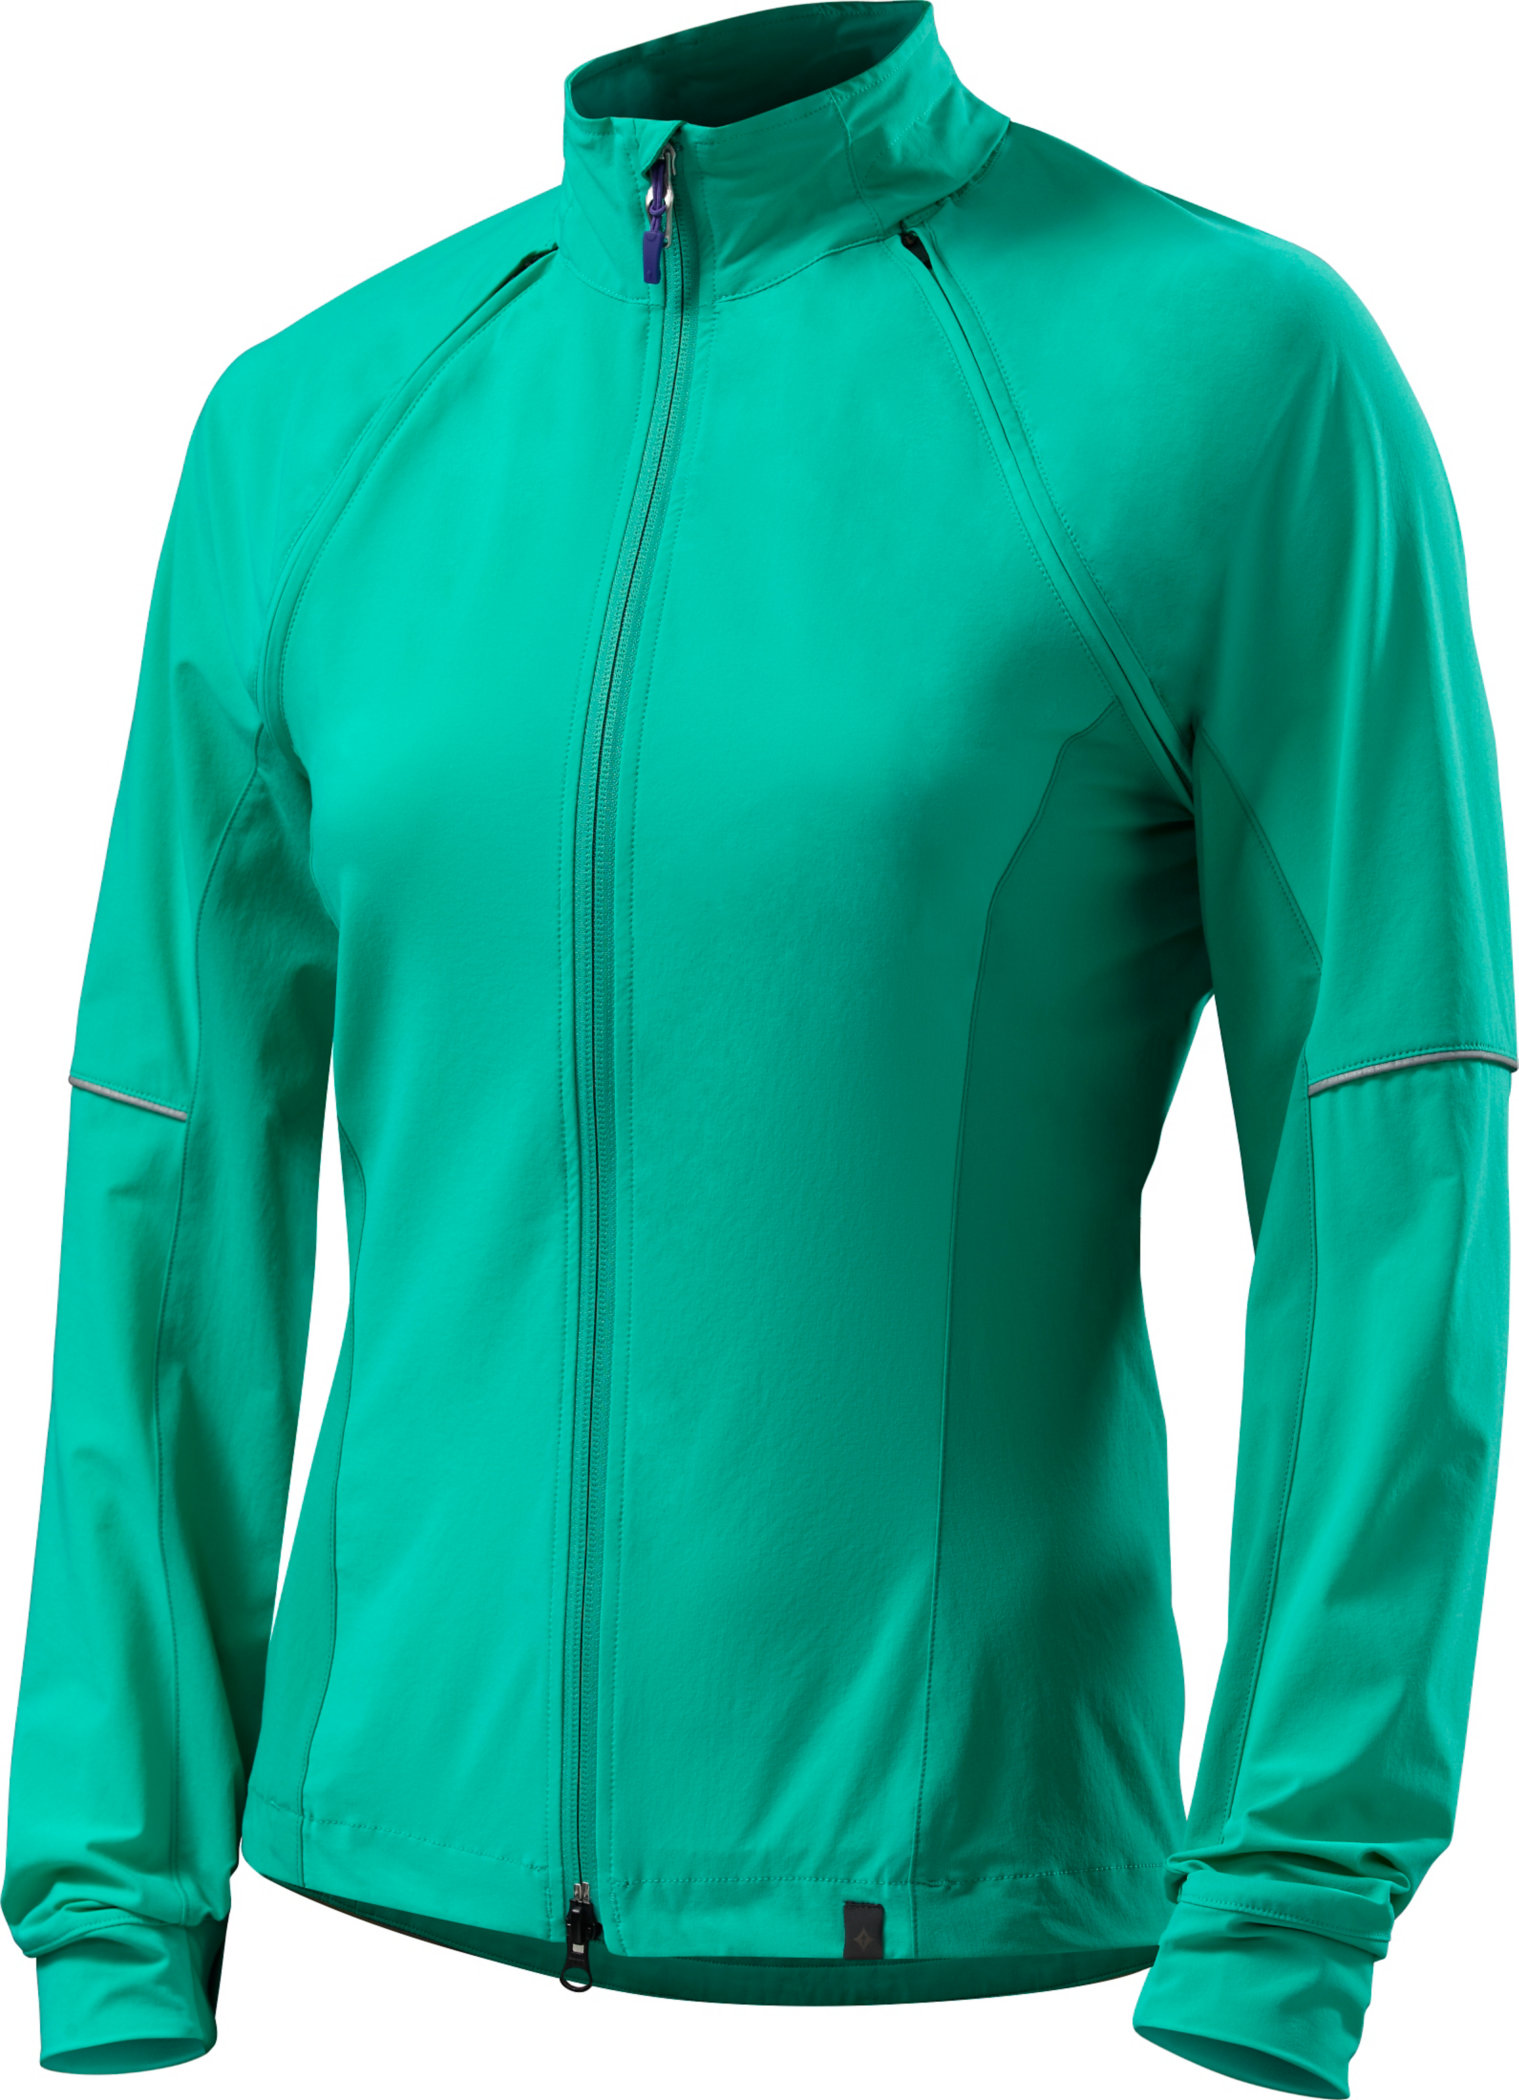 Specialized Women´s Deflect Hybrid Jacket Emerald Green Medium - Alpha Bikes